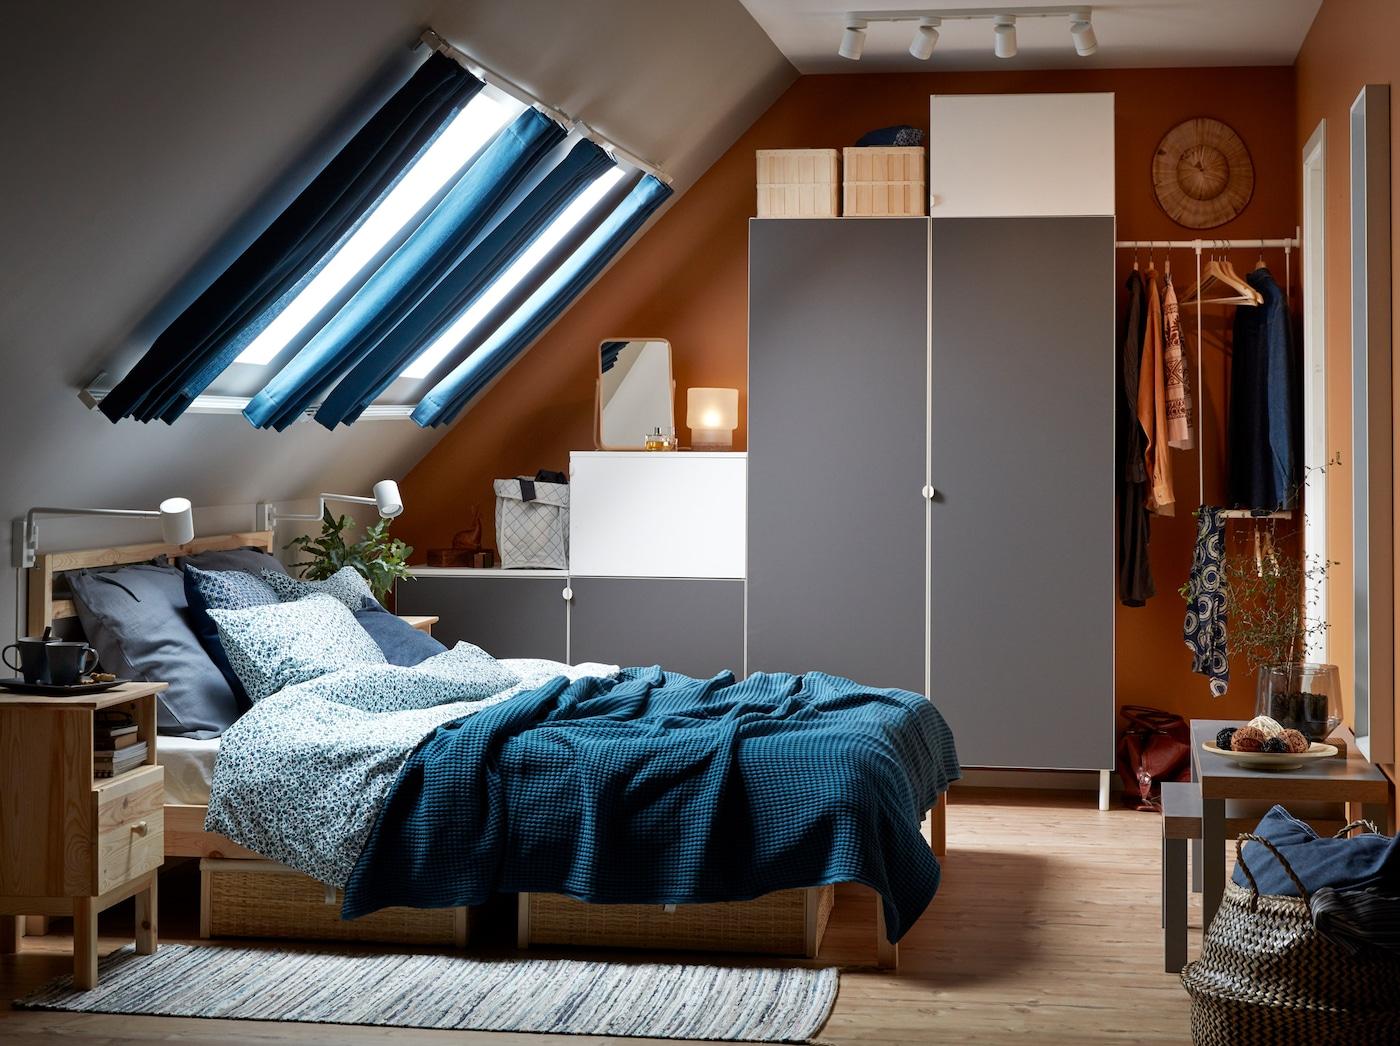 clevere l sungen f r verwinkelte schlafzimmer ikea. Black Bedroom Furniture Sets. Home Design Ideas